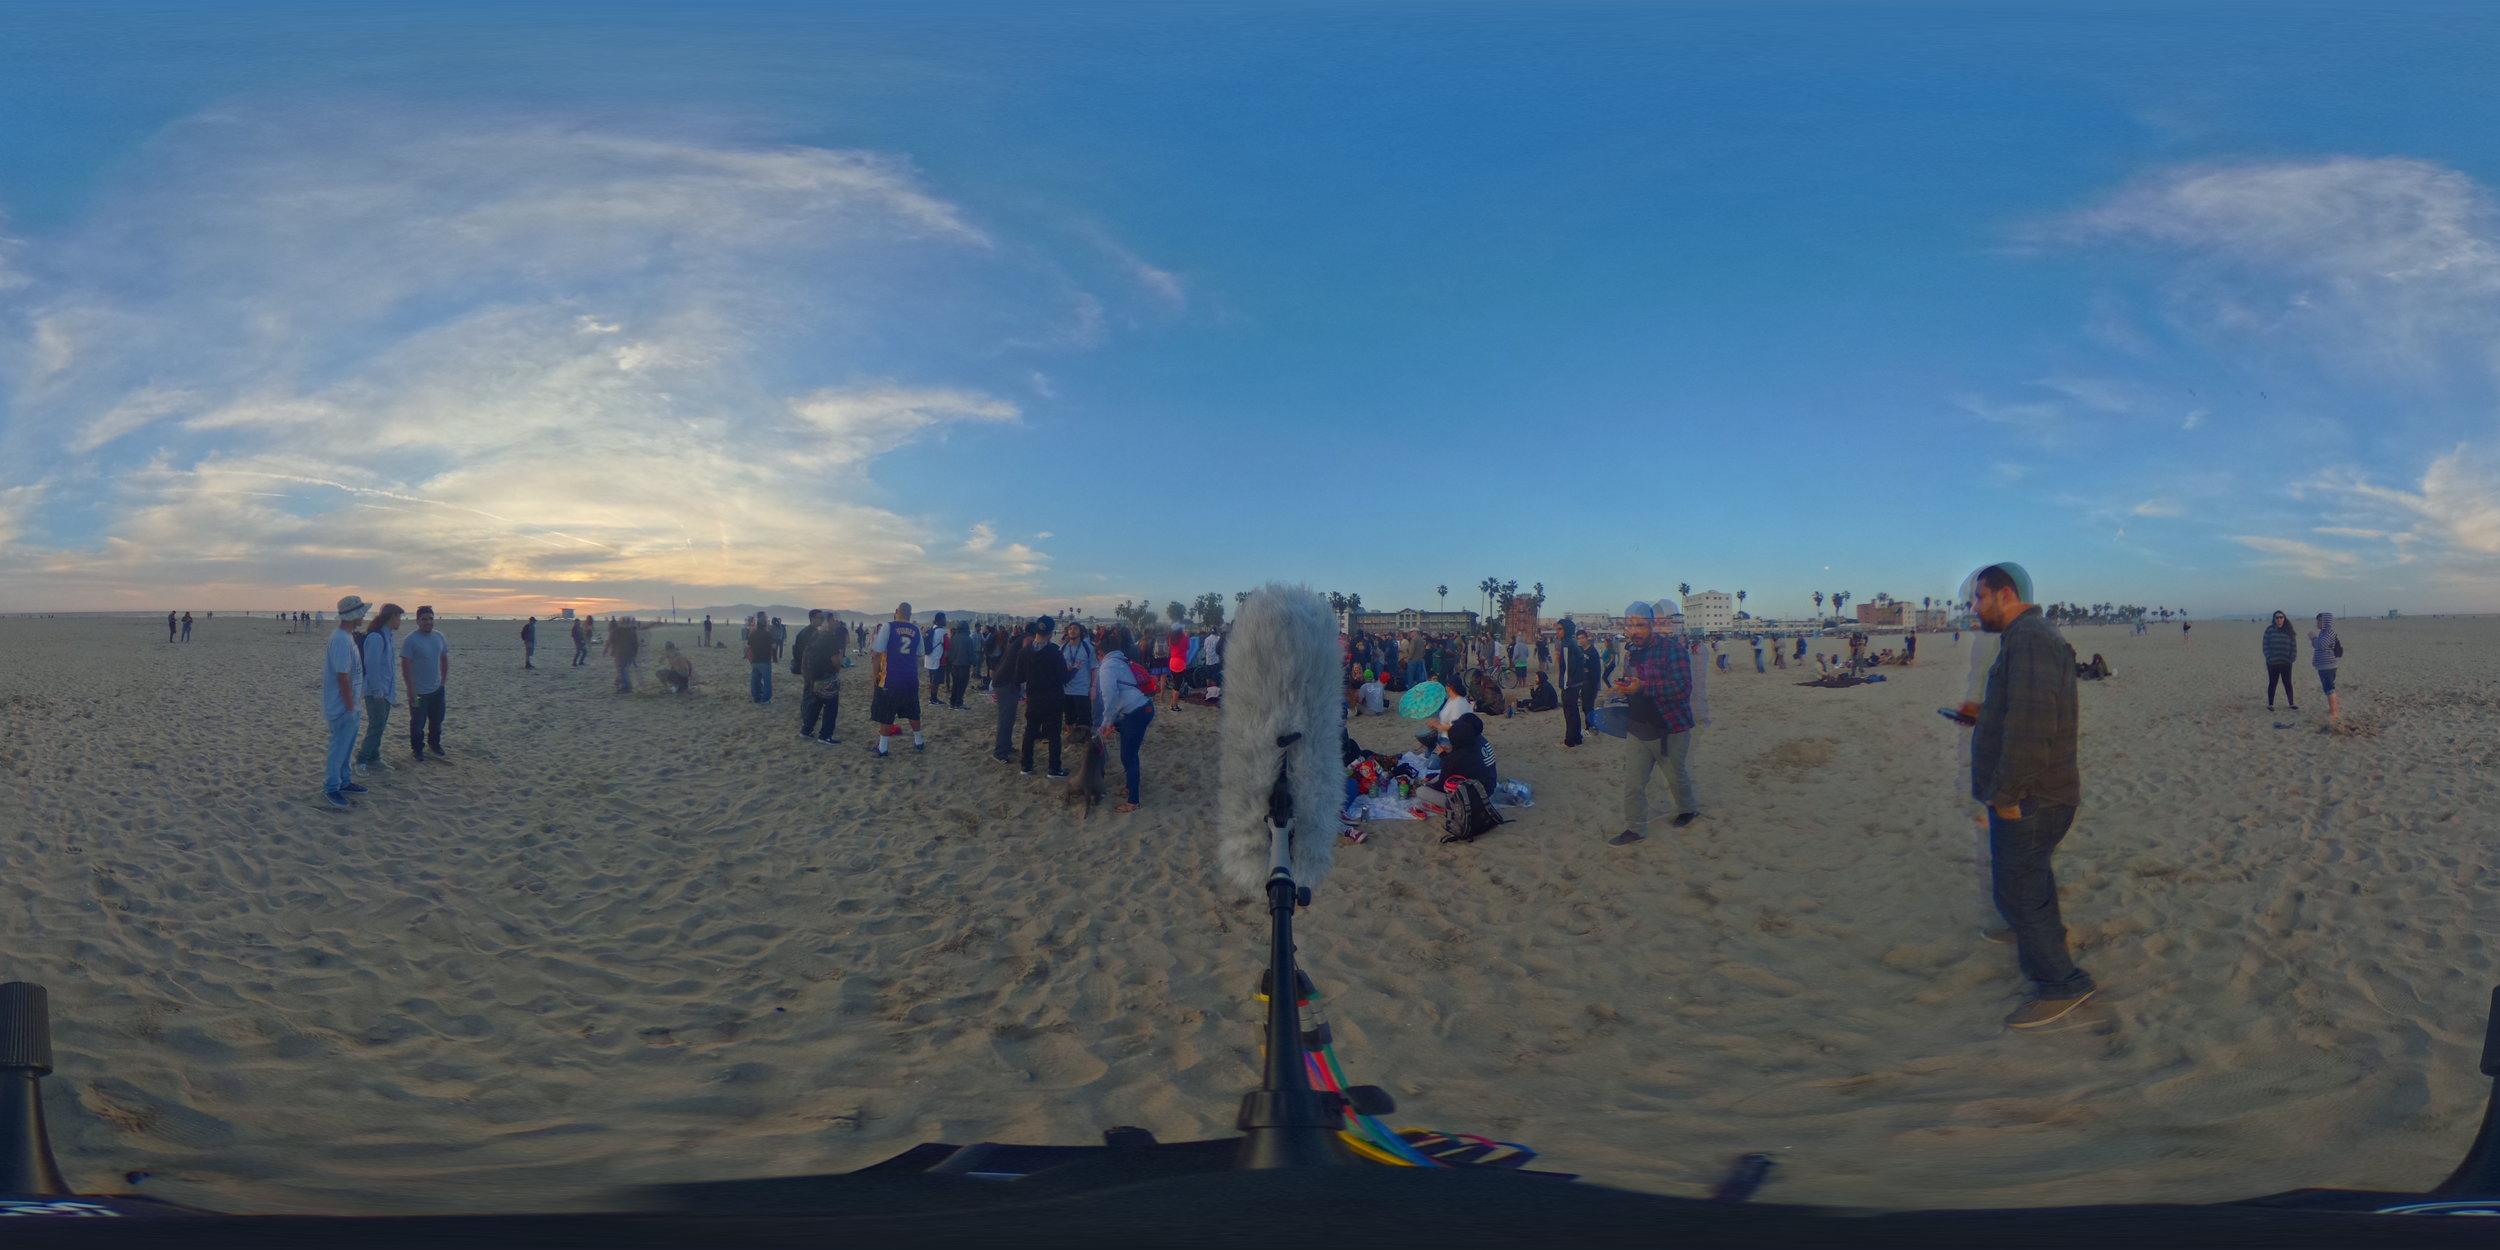 EXT_Day_Beach_CloseDrumCircle_MediumCrowd_DistantWaves_JPEG.JPG